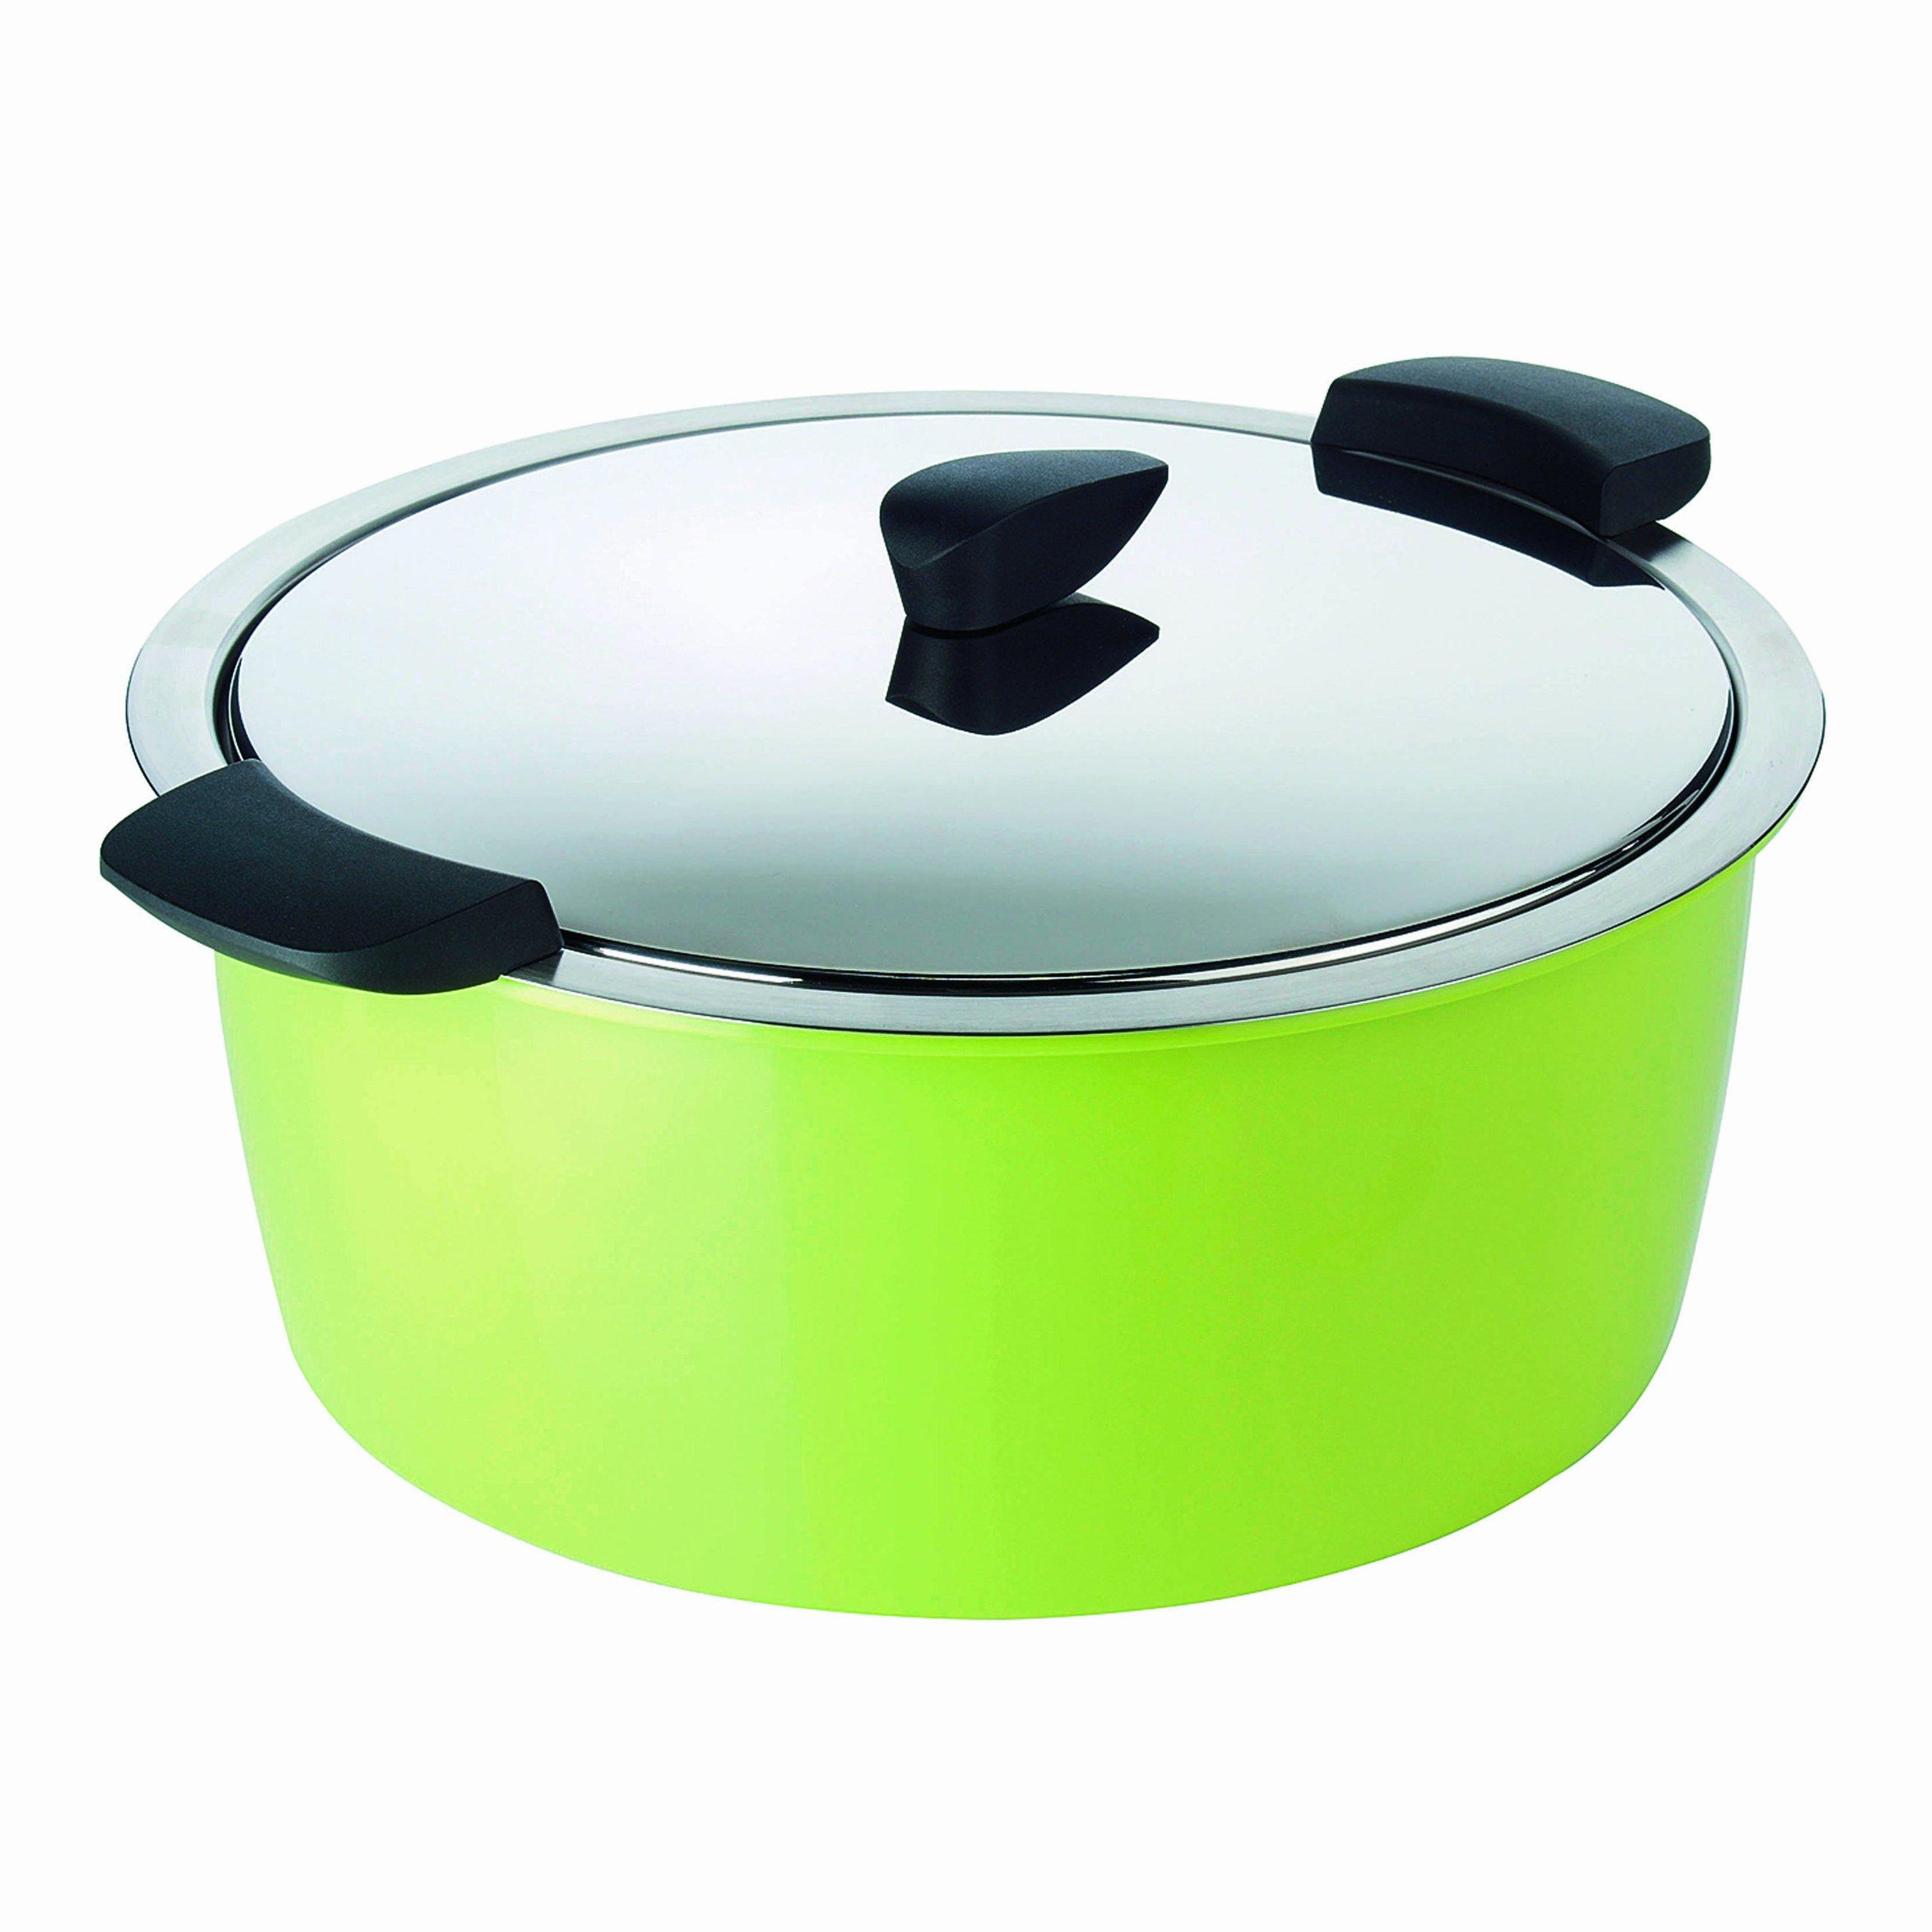 Kuhn Rikon 4.5-Quart Hotpan Braiser, Green